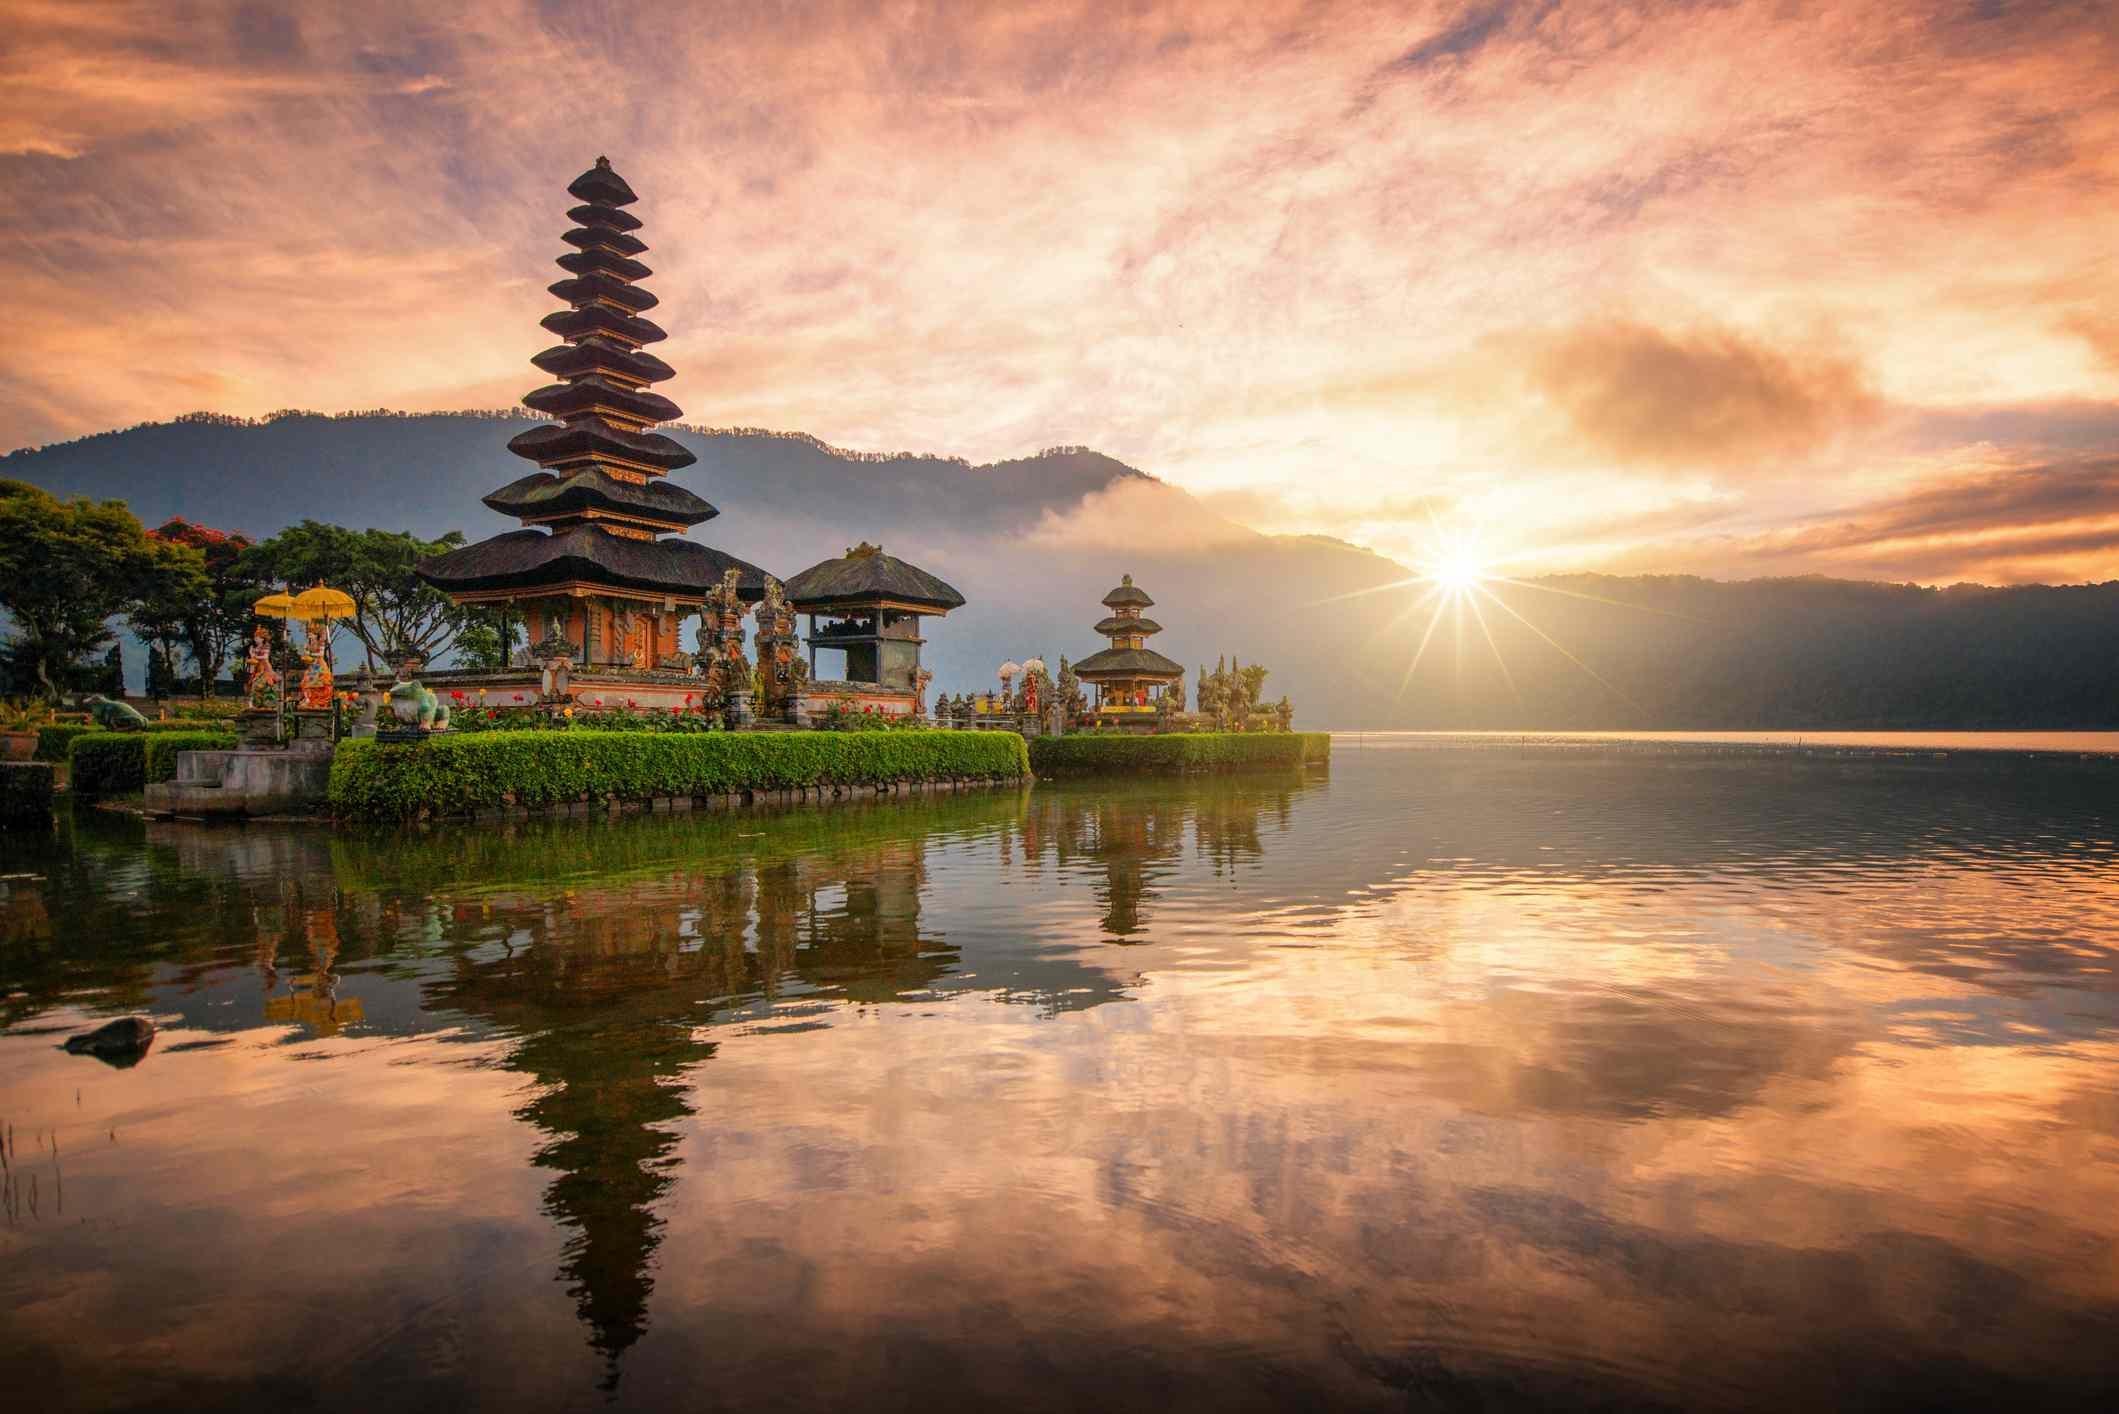 Pura Ulun Danu Bratan, Hindu temple on Bratan lake landscape, one of famous tourist attraction in Bali, Indonesia